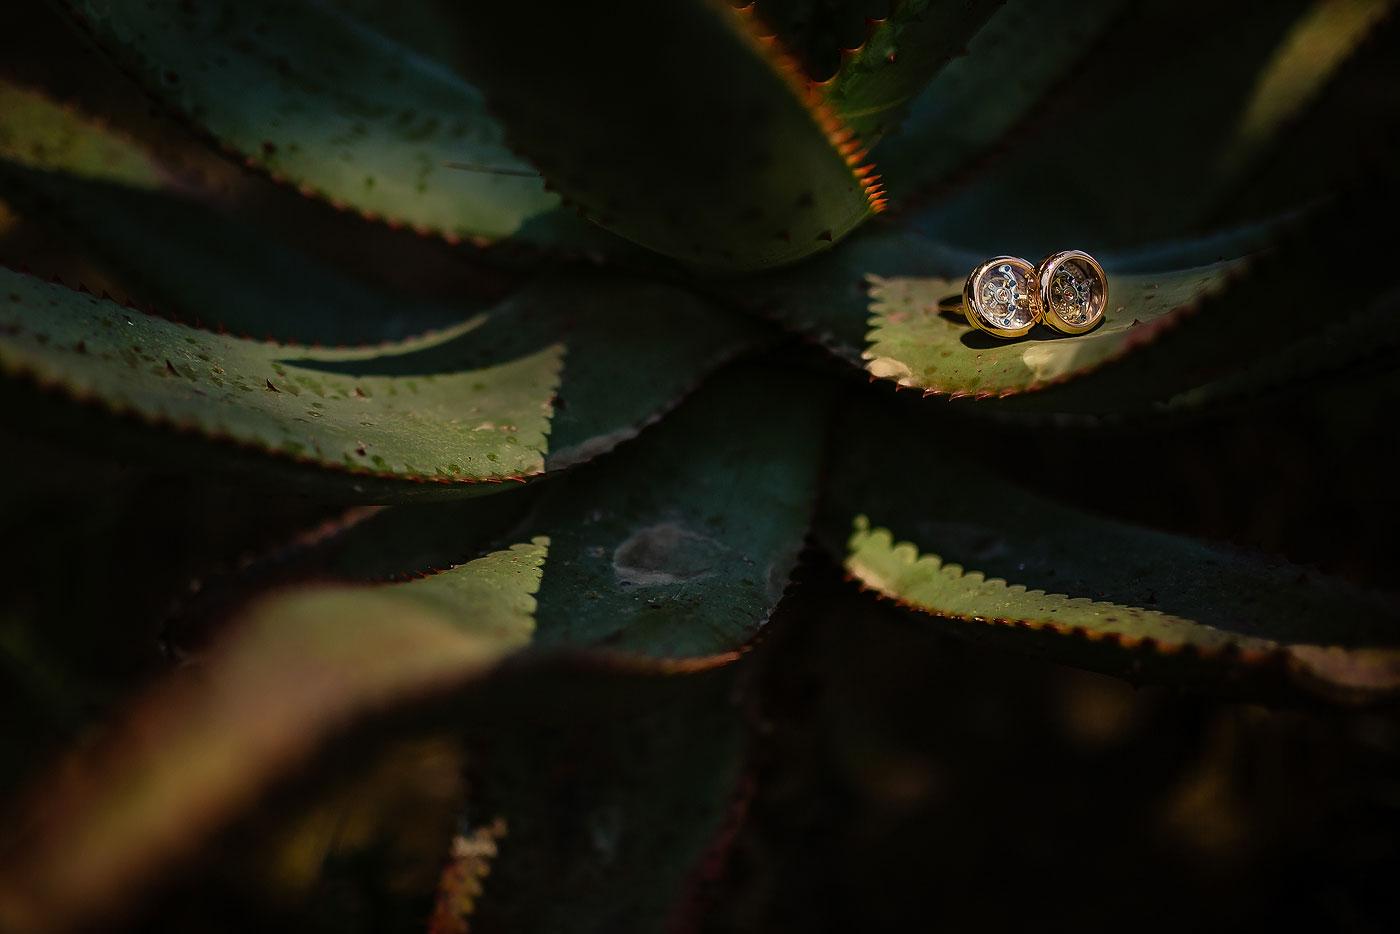 Groom Wedding Cuff-links